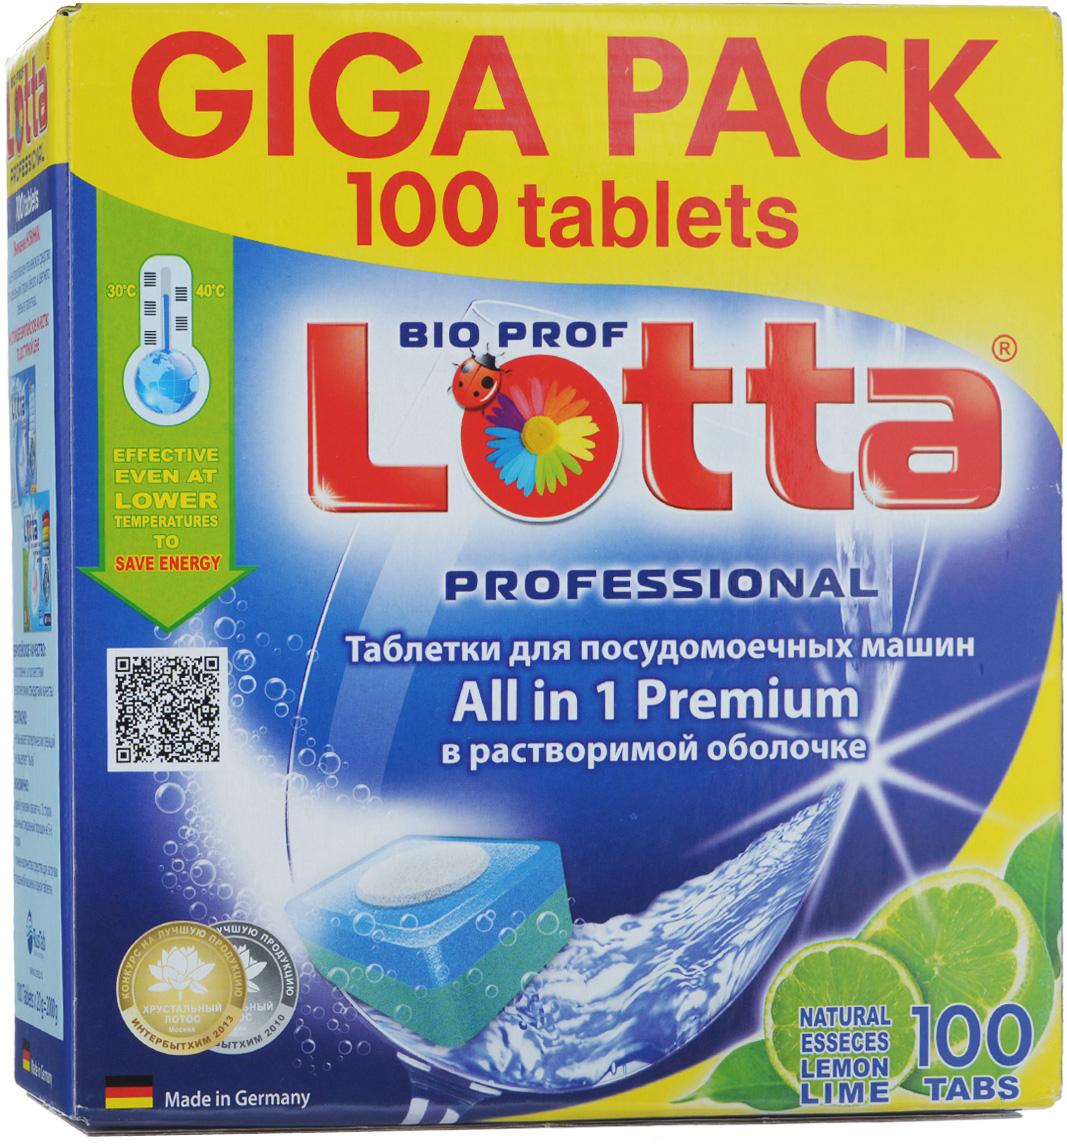 Таблетки для посудомоечных машин Lotta All in 1 Premium, c ароматом лимона, 100 шт таблетки для пмм lotta таблетки lotta 30 шт